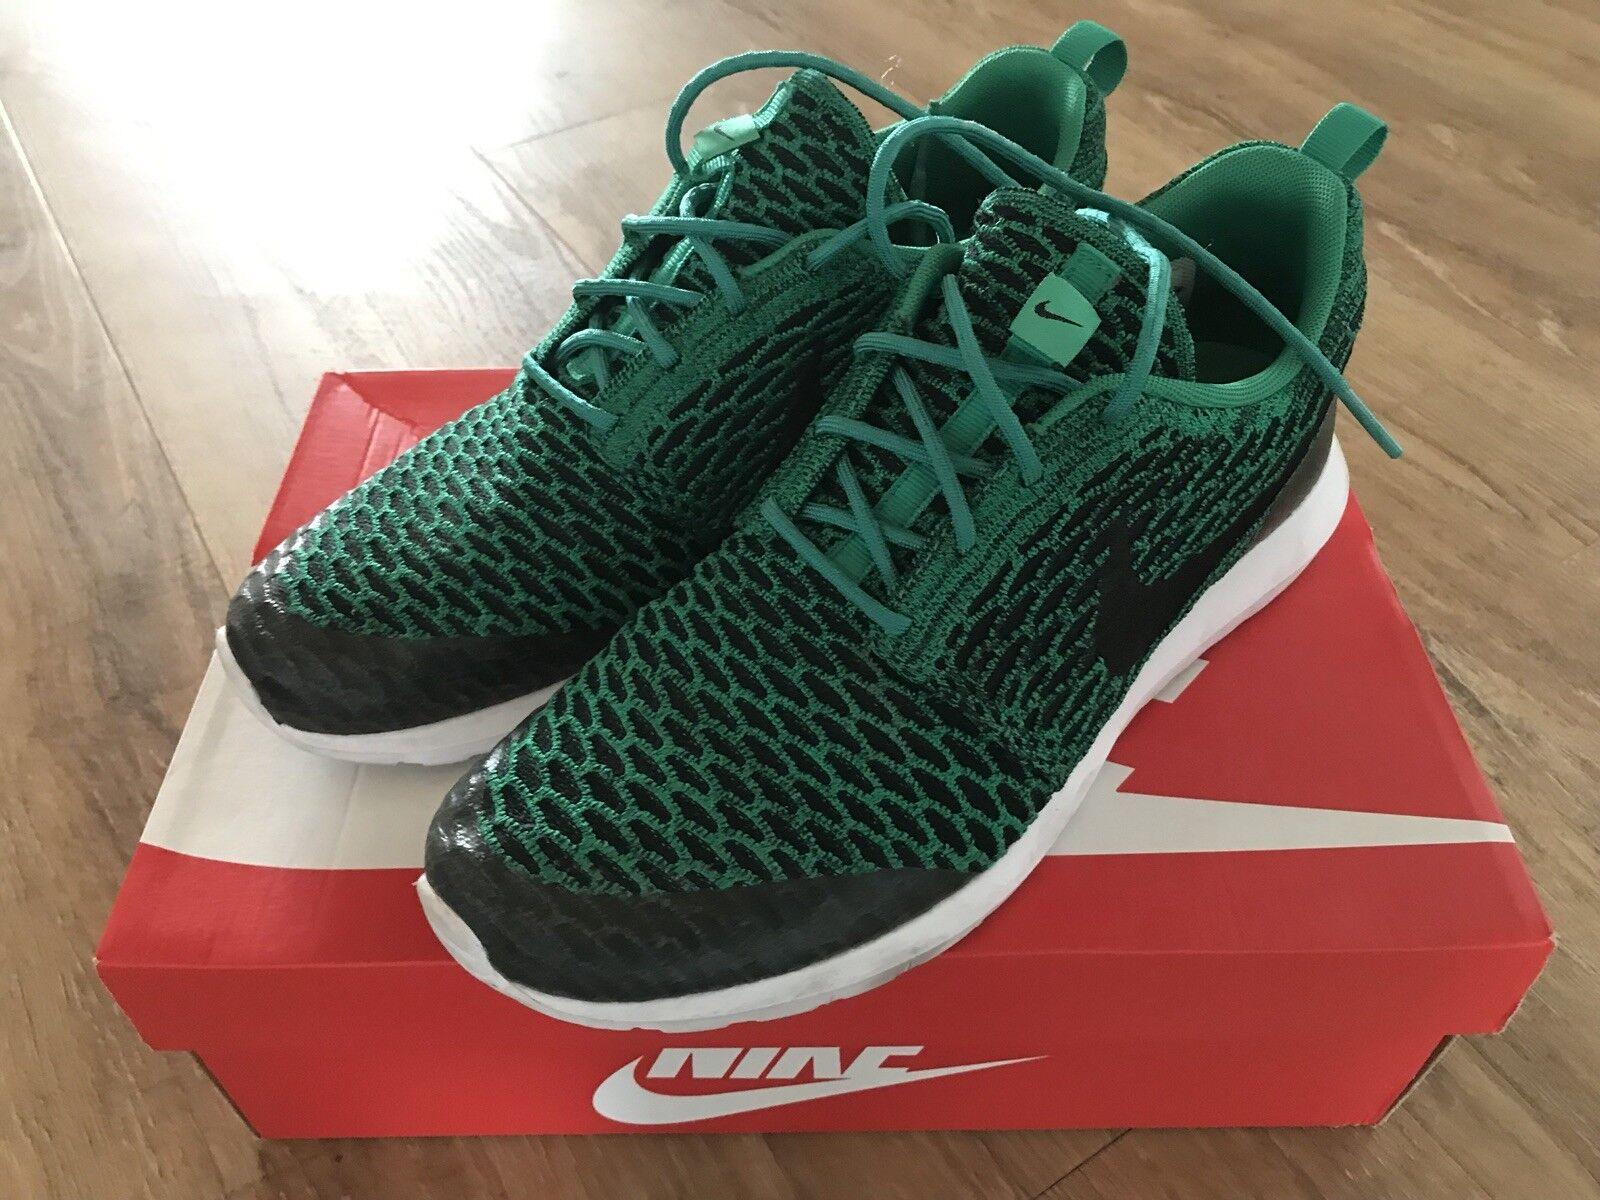 Billig hohe 42,5 Qualität Nike Schuhe Herren 42,5 hohe 718d37